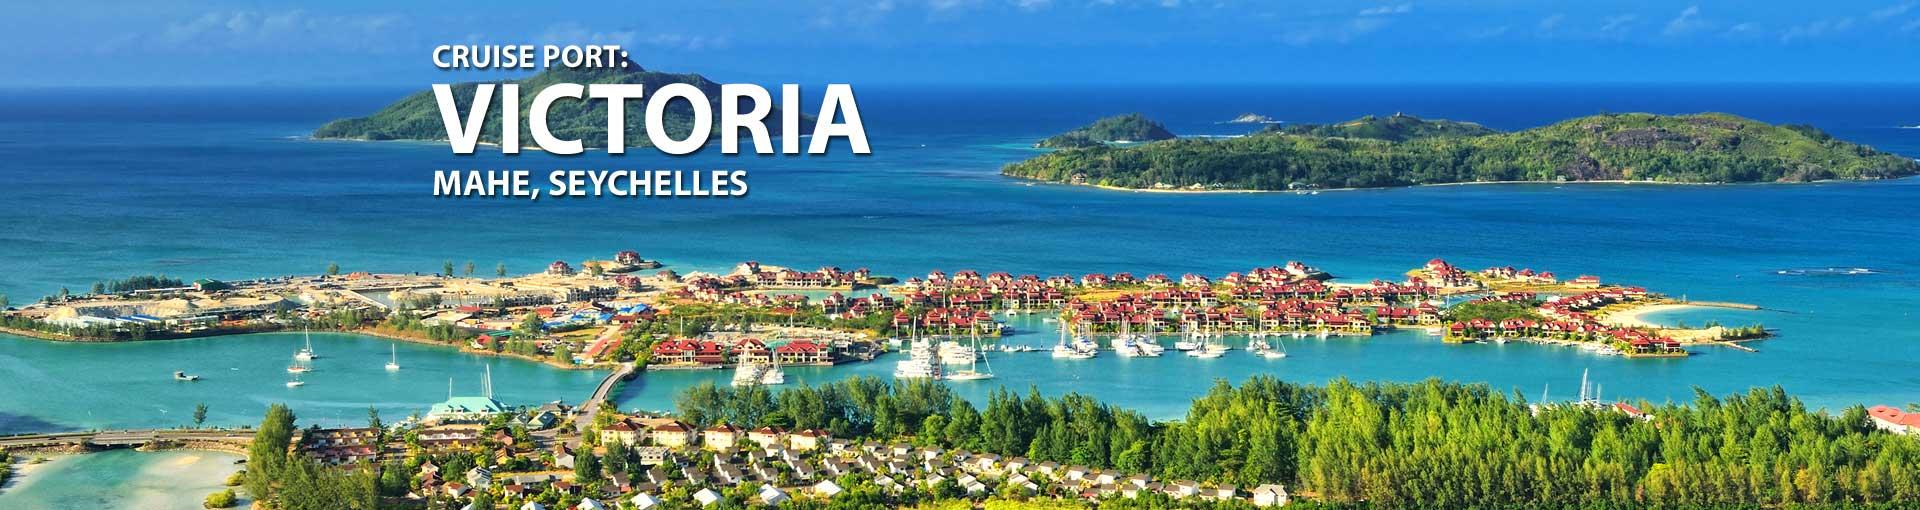 Cruises to Victoria, Mahe, Seychelles